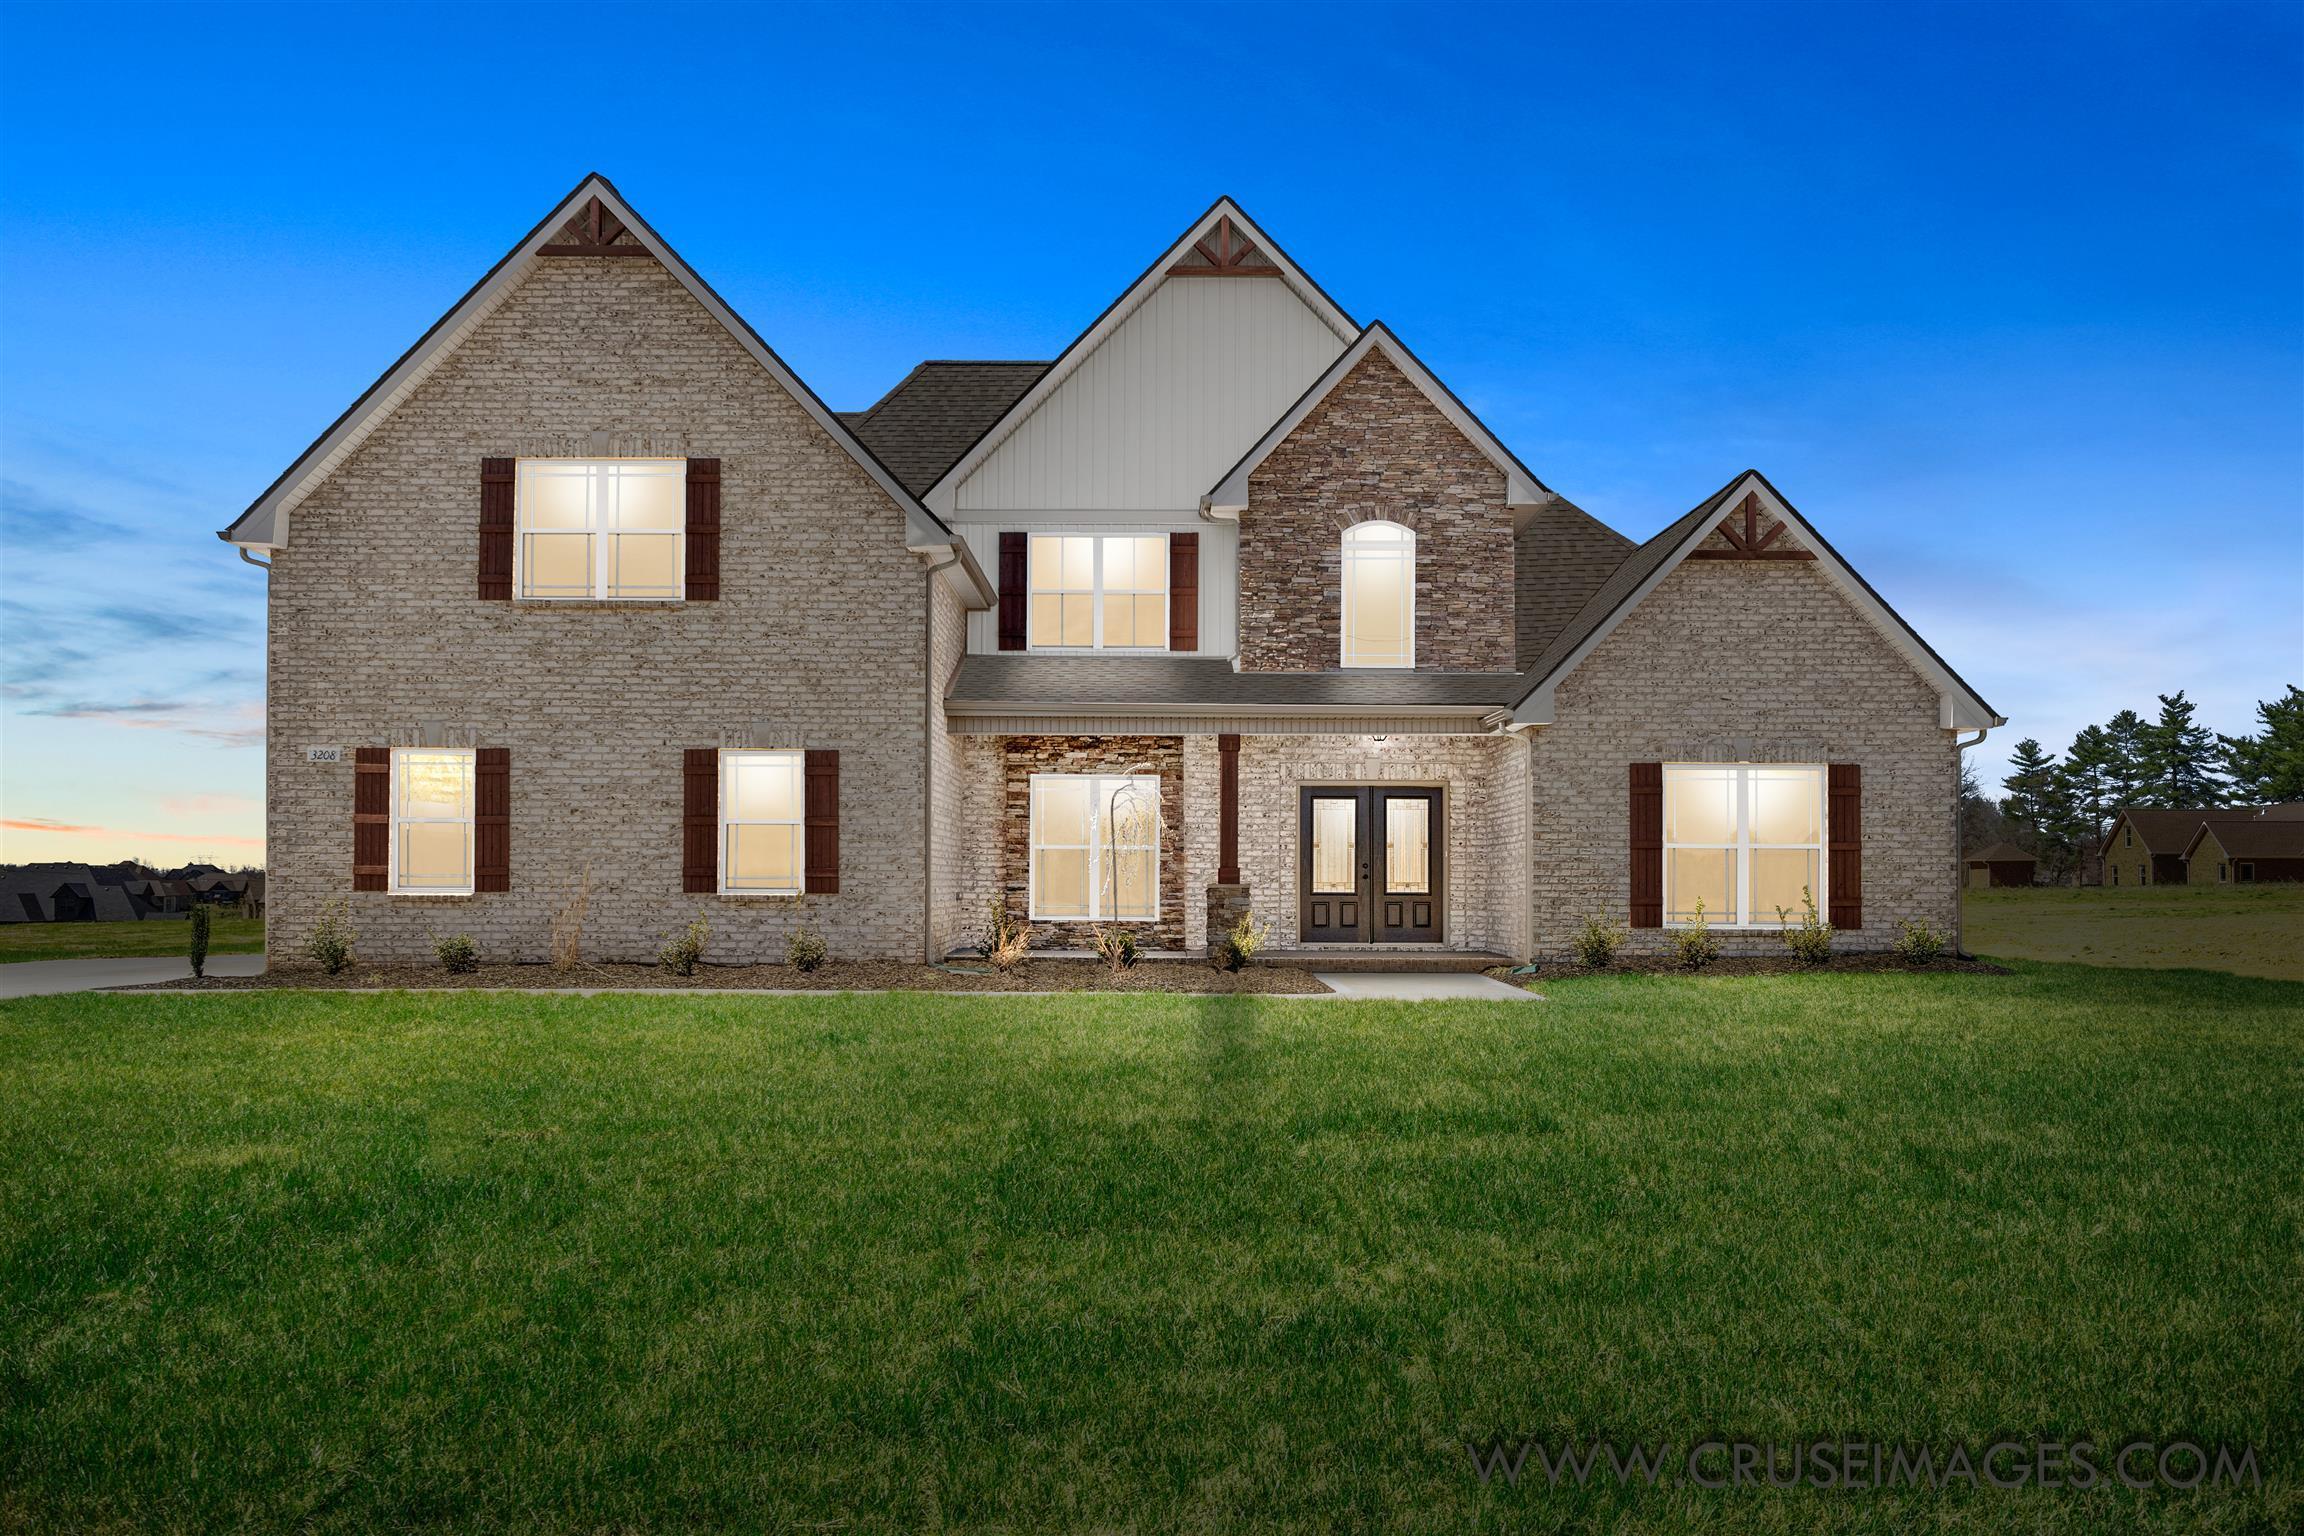 3208 Dunlop Lane, Clarksville, TN 37043 - Clarksville, TN real estate listing